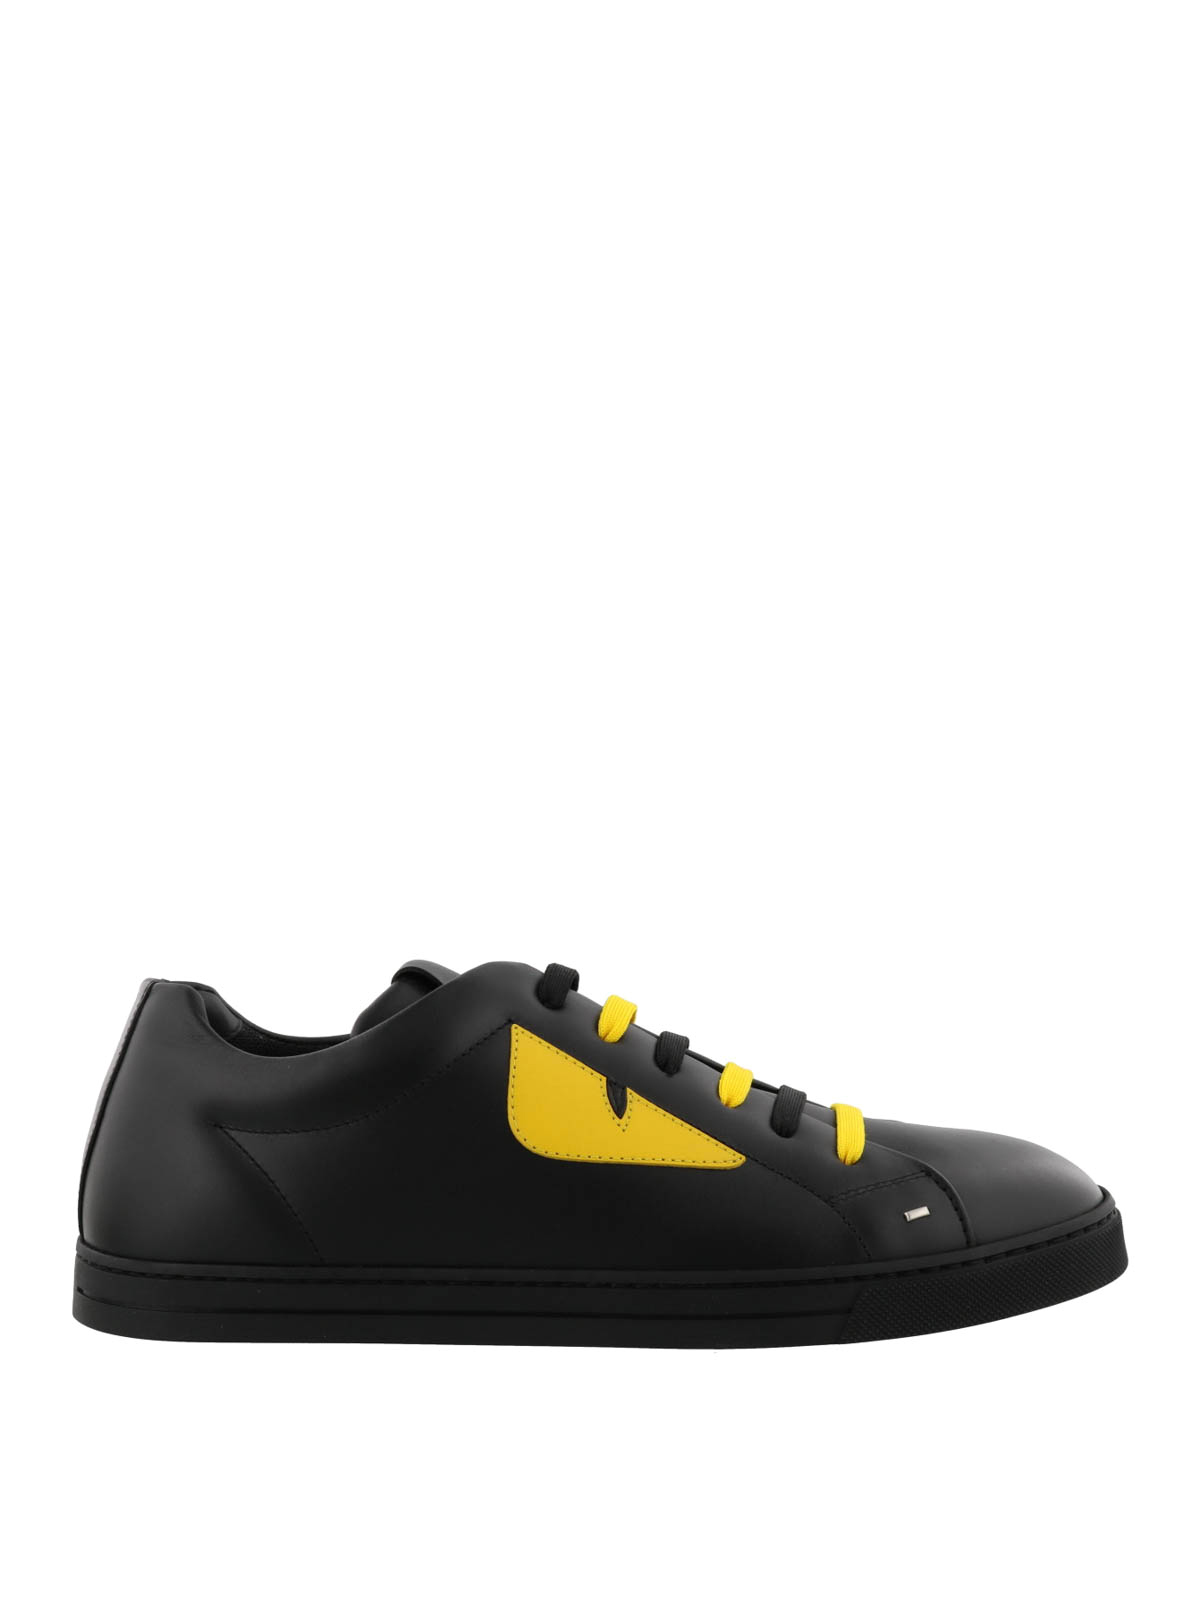 1fad9957 Fendi - Bag Bugs sneakers - trainers - 7E1071TTYF07OM | iKRIX.com